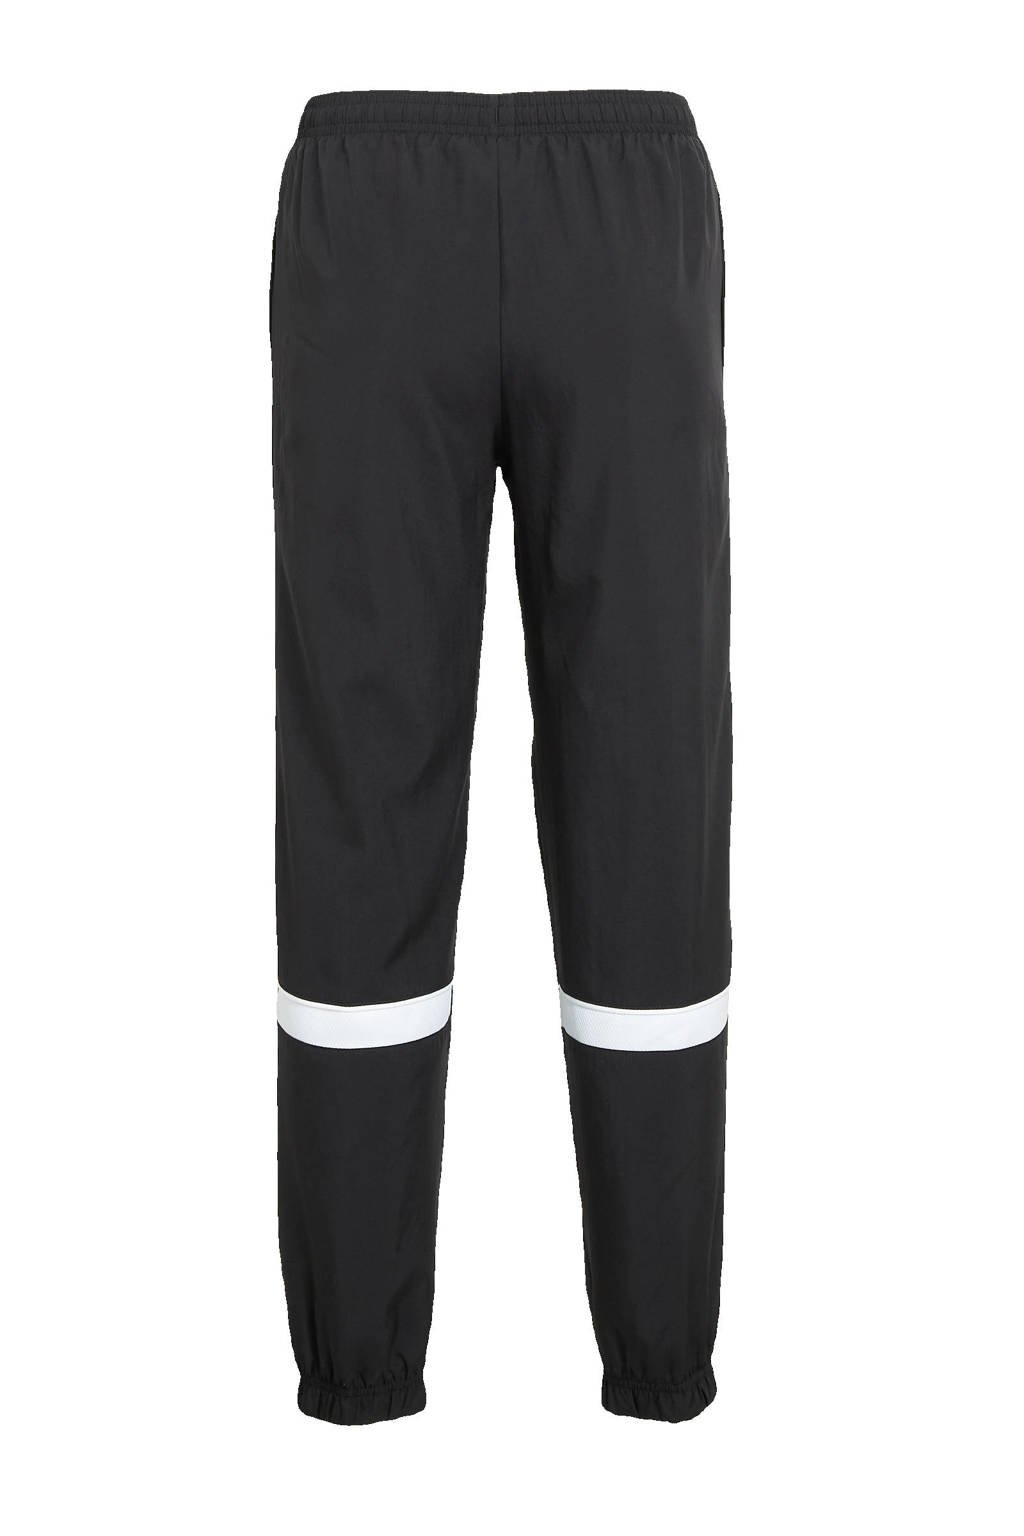 Nike   trainingsbroek zwart/wit, Zwart/wit